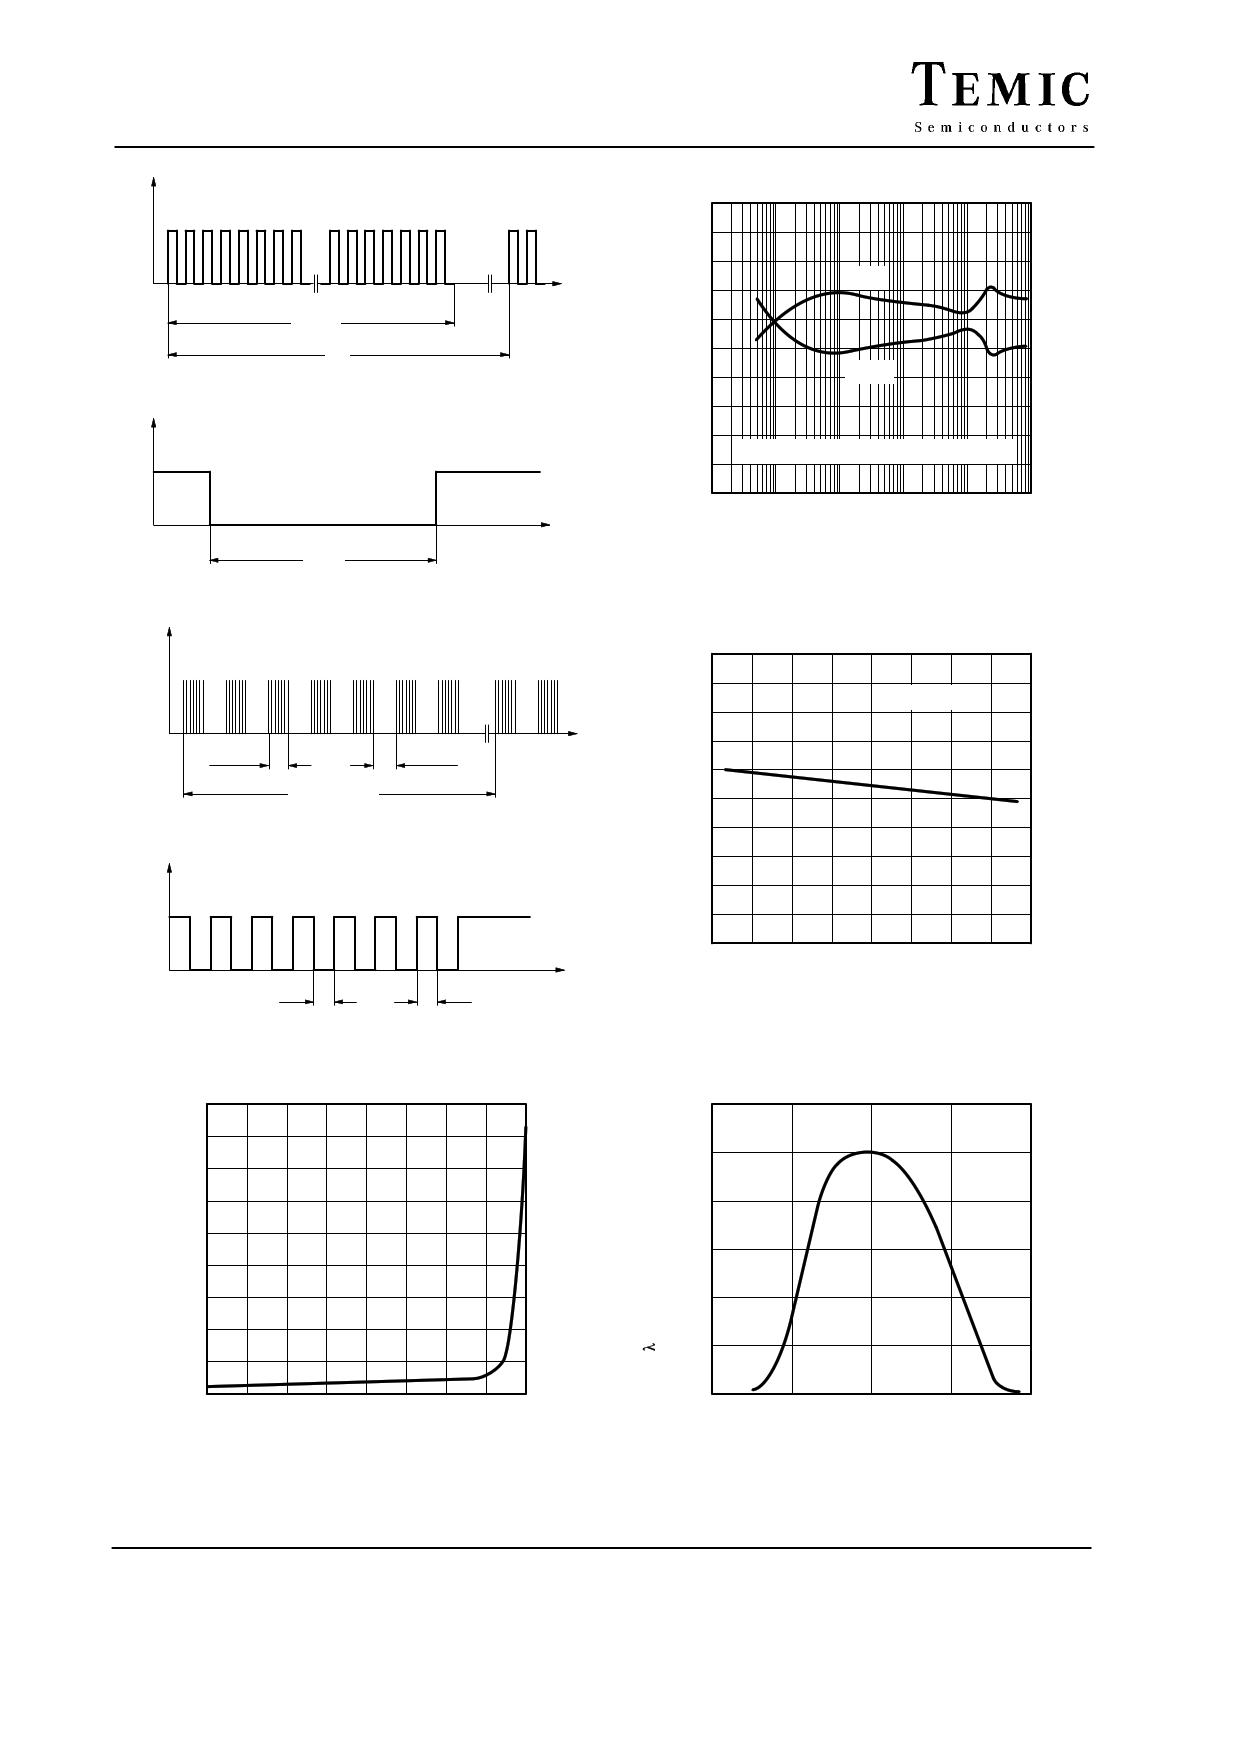 TFMT5380 pdf, 반도체, 판매, 대치품